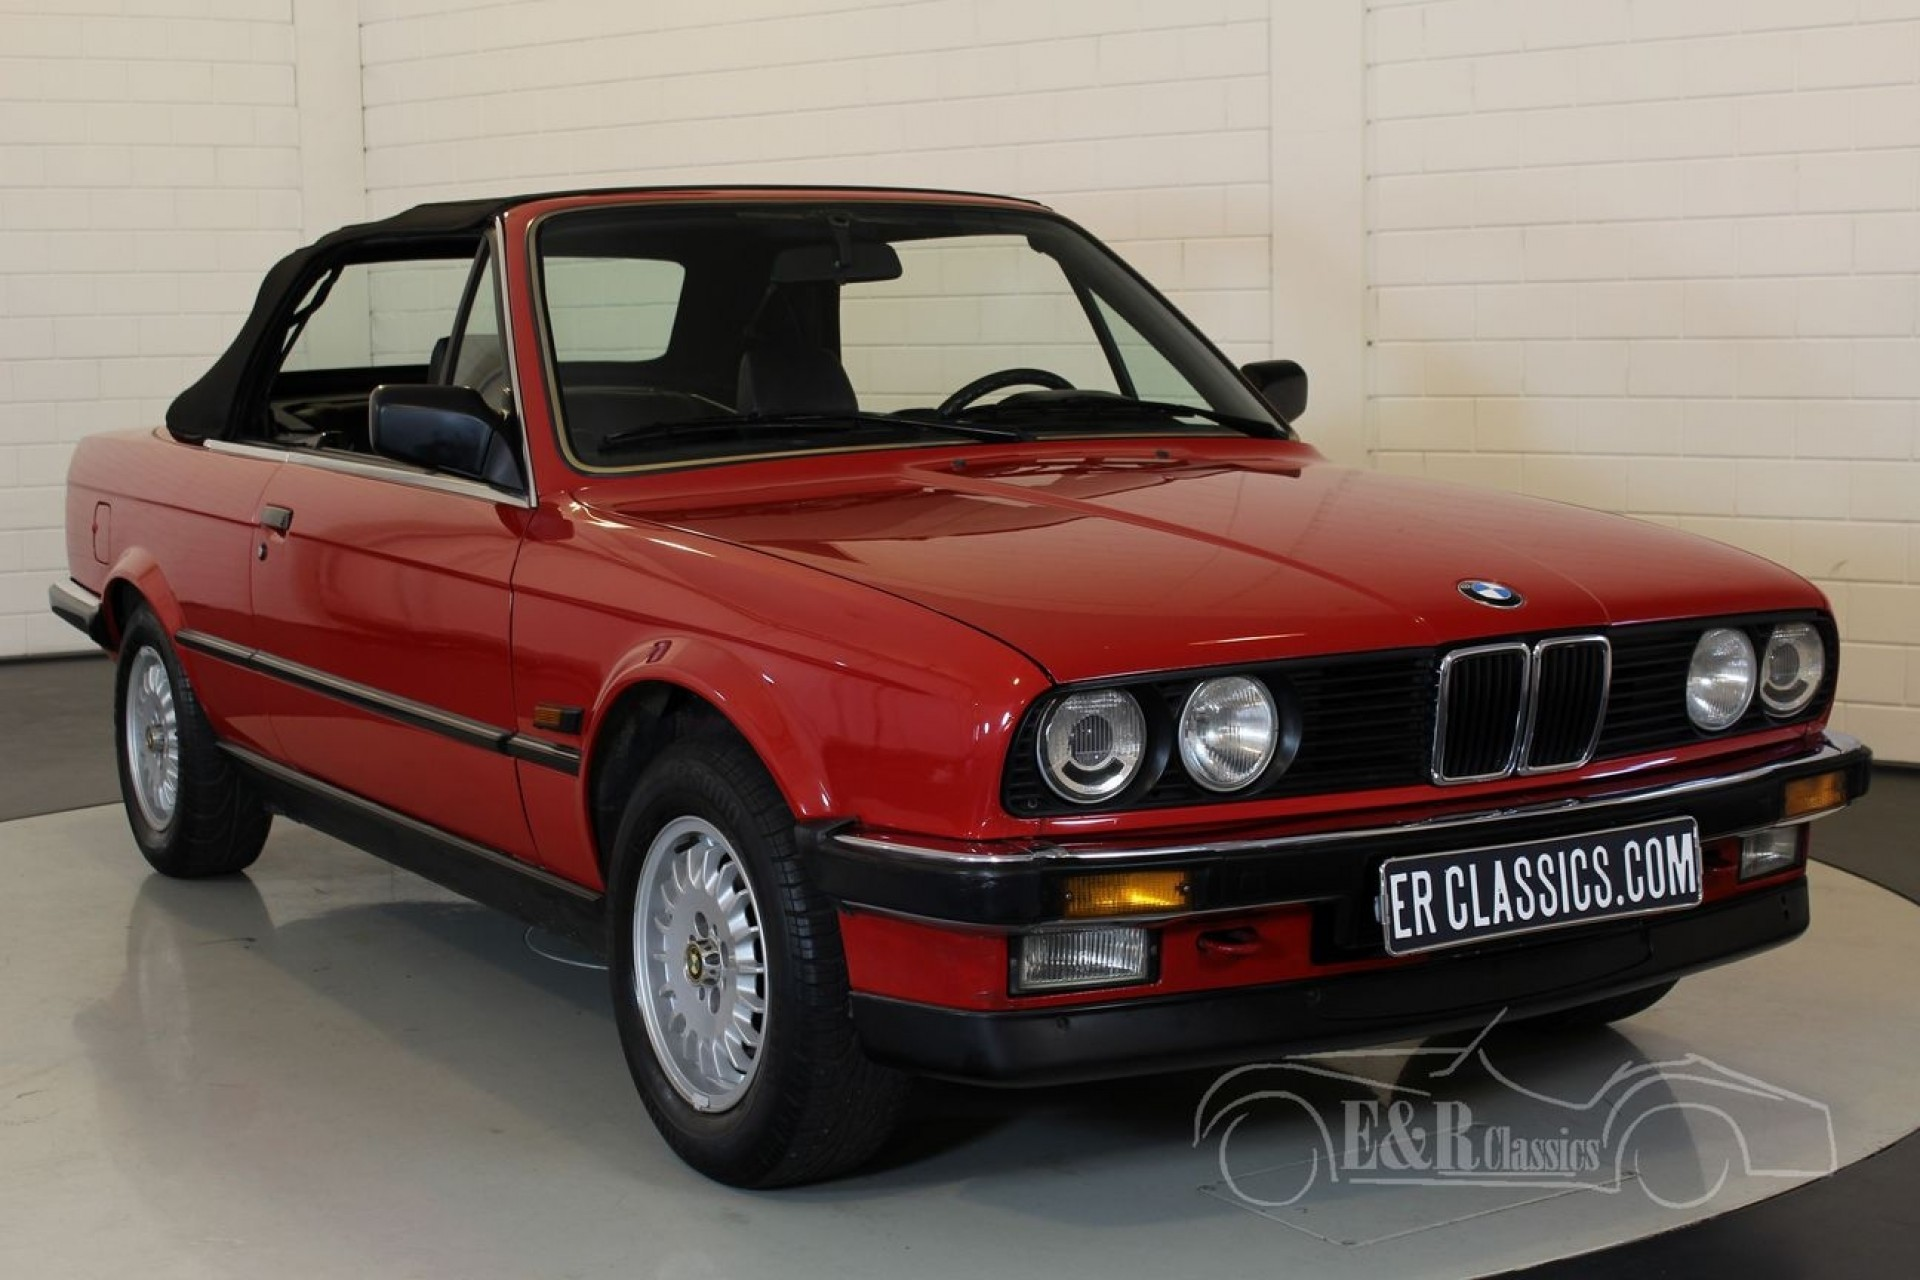 BMW 320i (E30) Cabriolet 1988 for sale at ERclassics